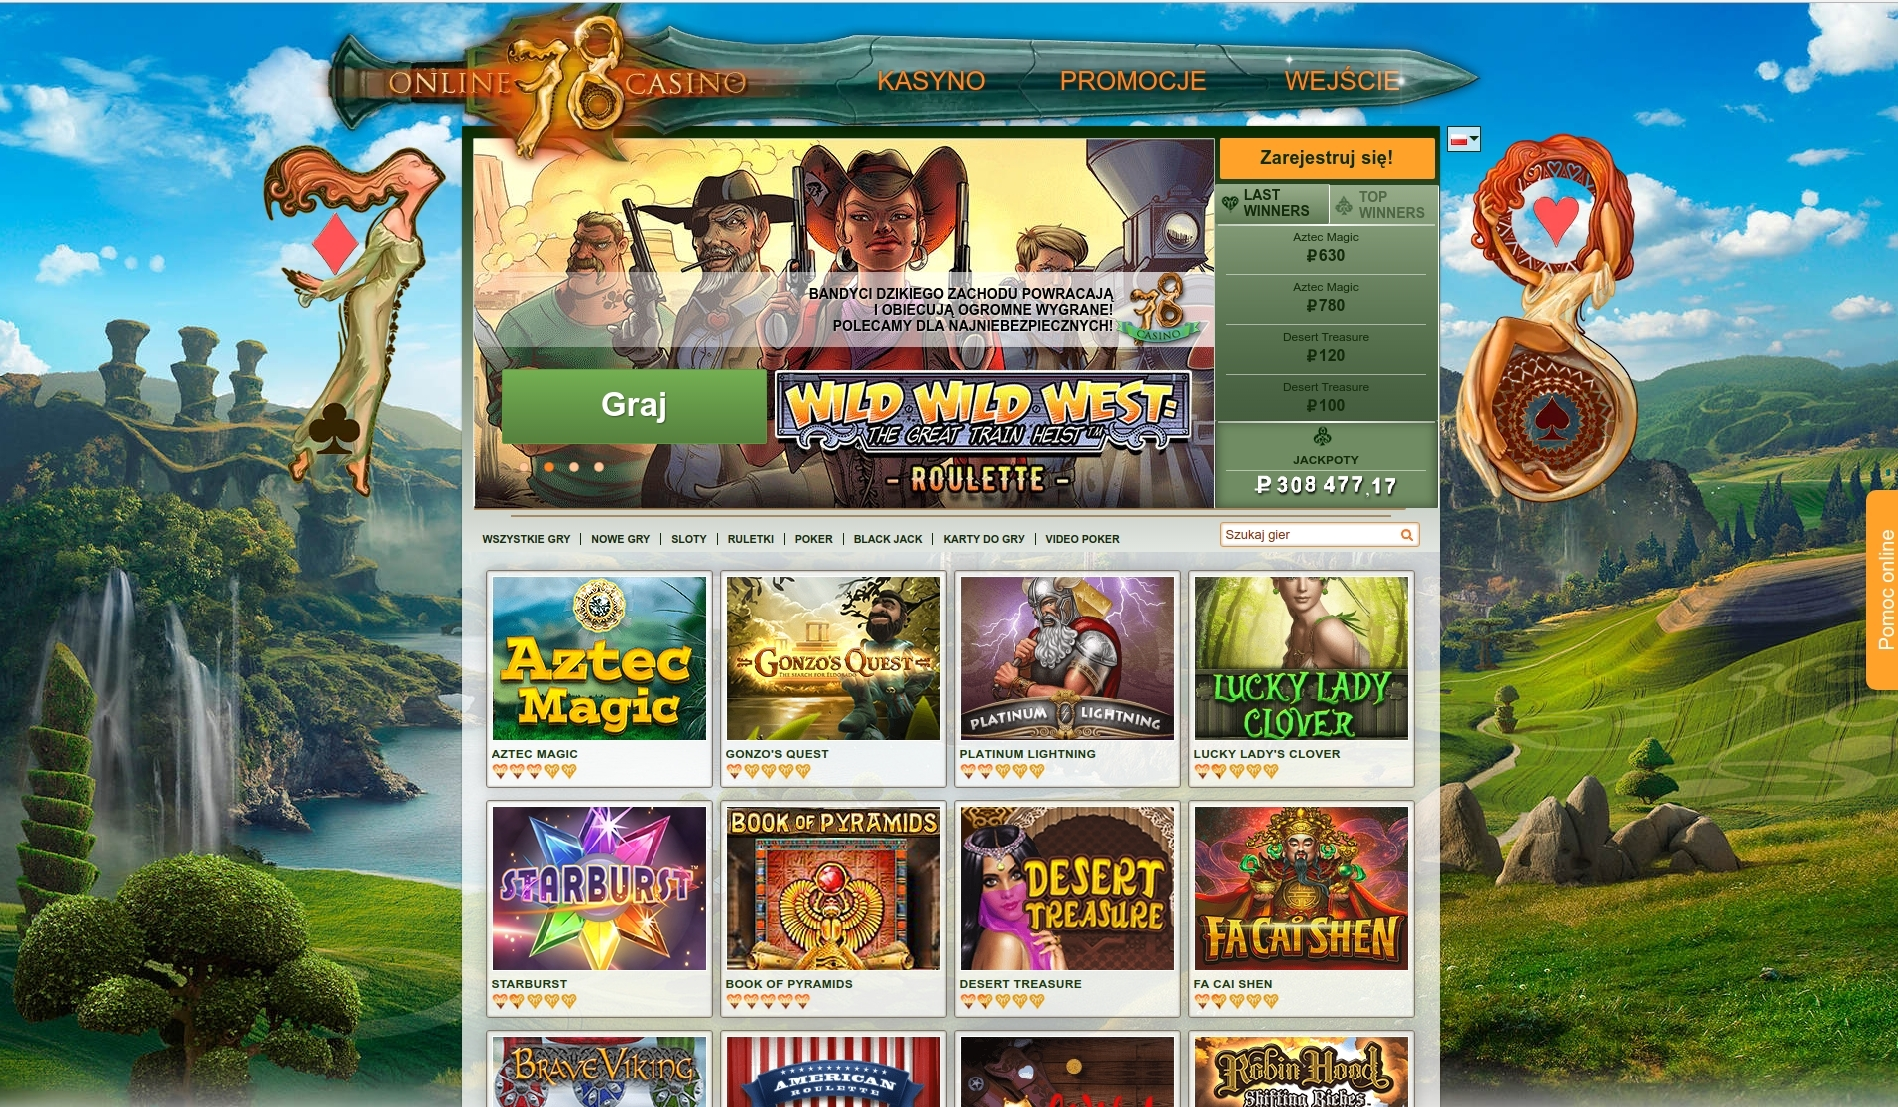 официальный сайт 11slot78 win казино онлайн